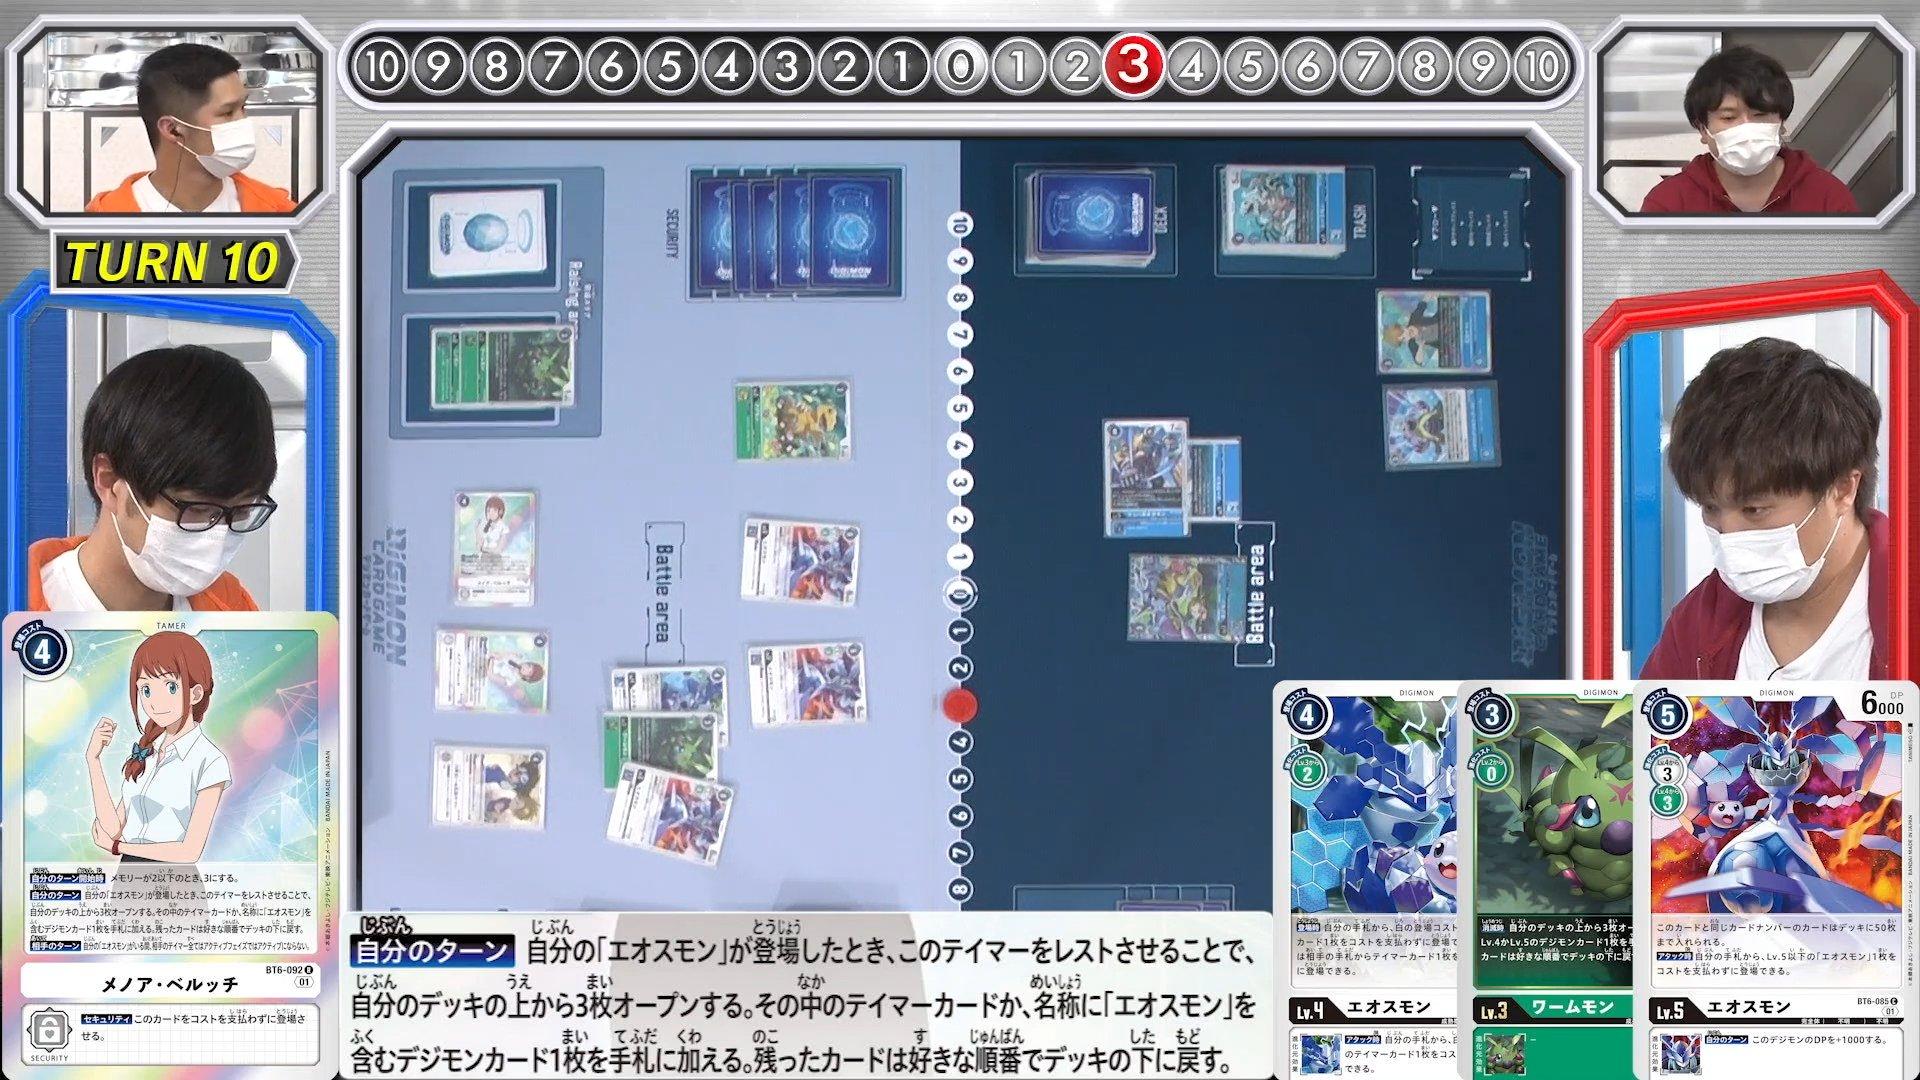 digimoncardbattle_v2_29_05_may13_2021.jpg